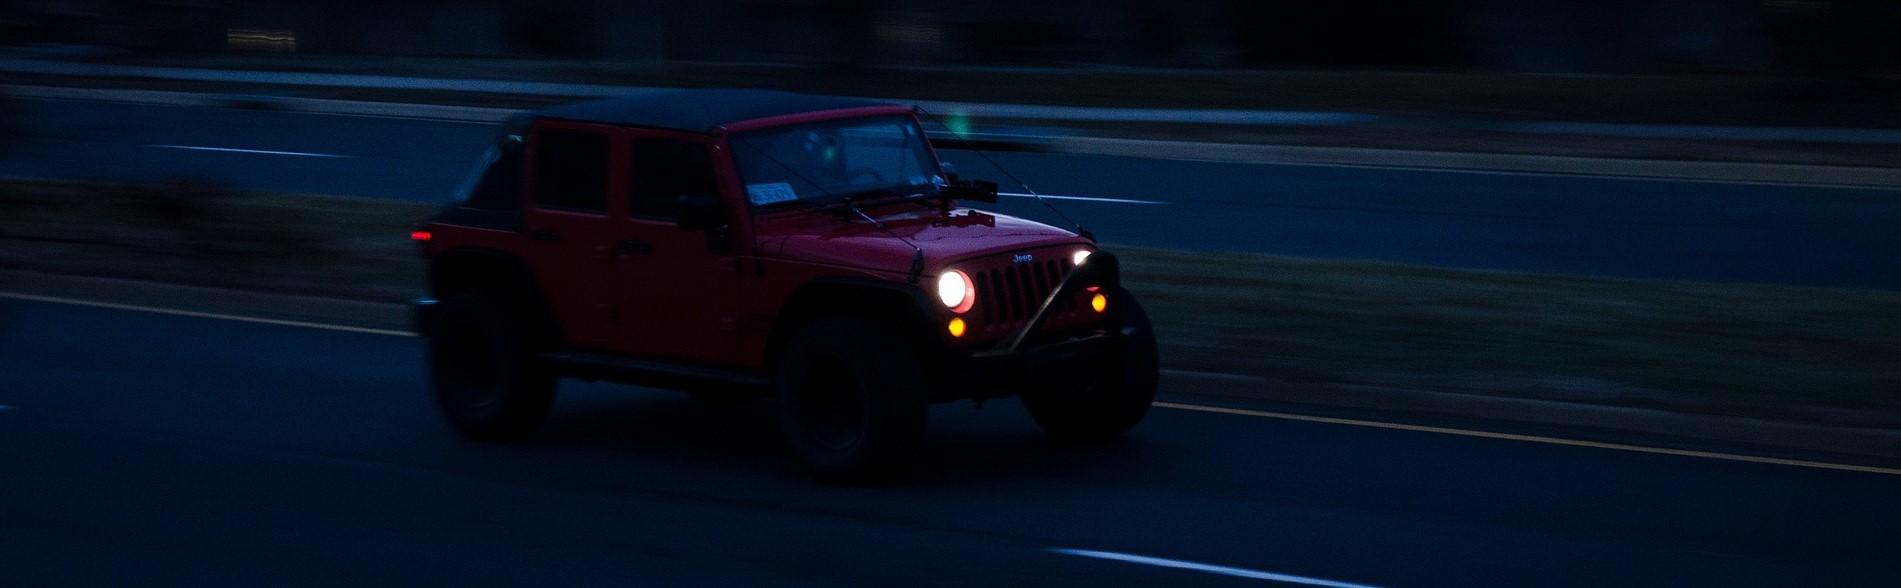 Red Jeep in Santa Clarita, California | Breast Cancer Car Donations